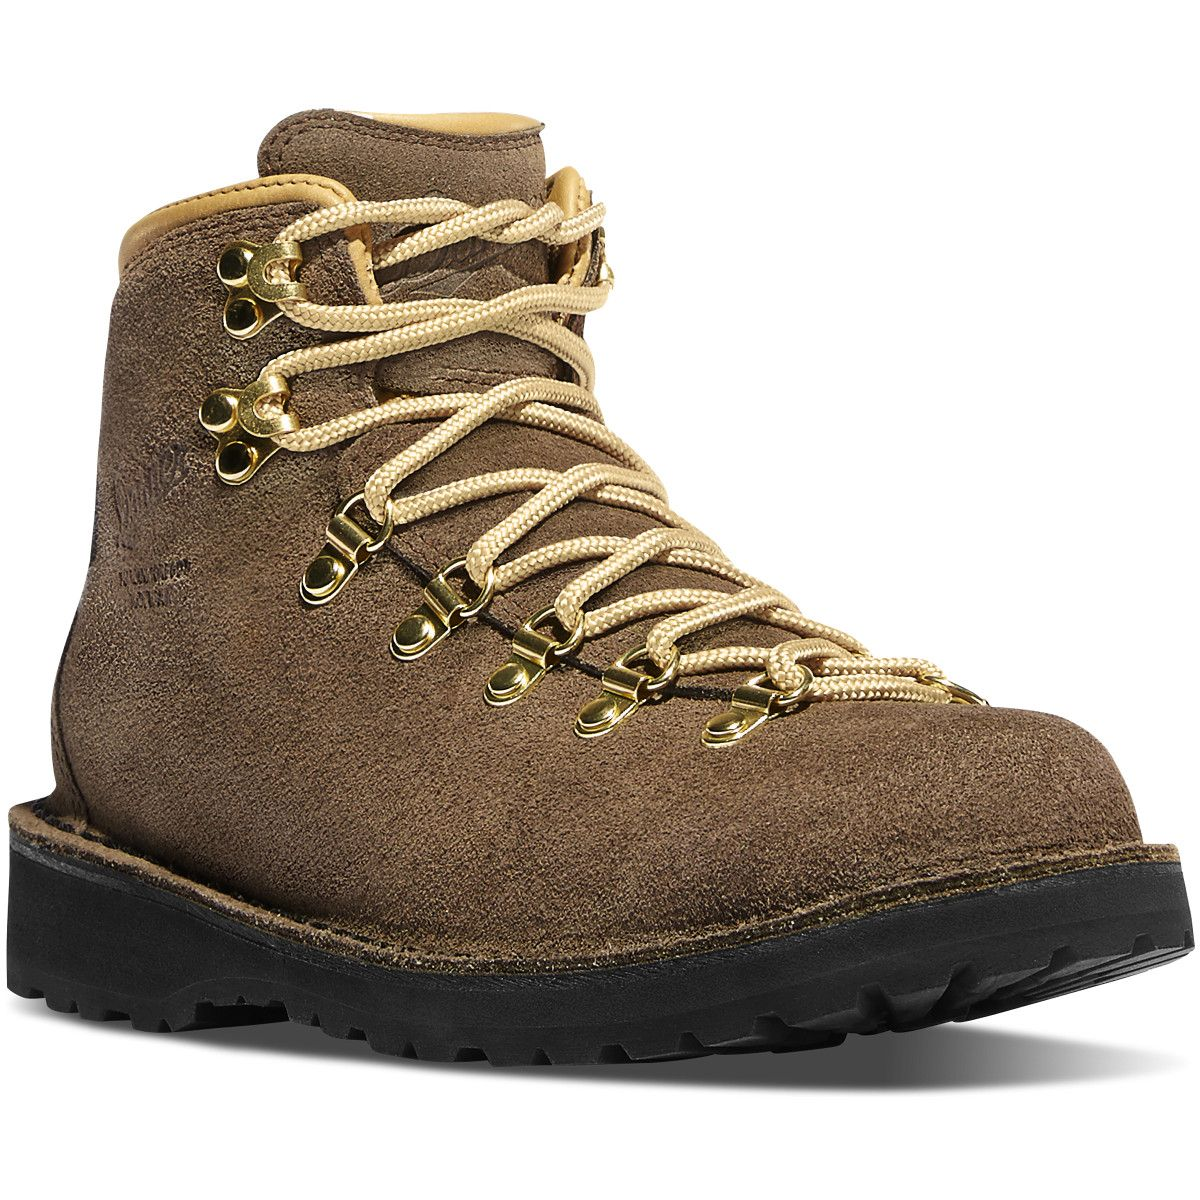 ffdda8222fb Danner - Women's Mountain Pass Major Brown | Bags, Boots, Shoes ...